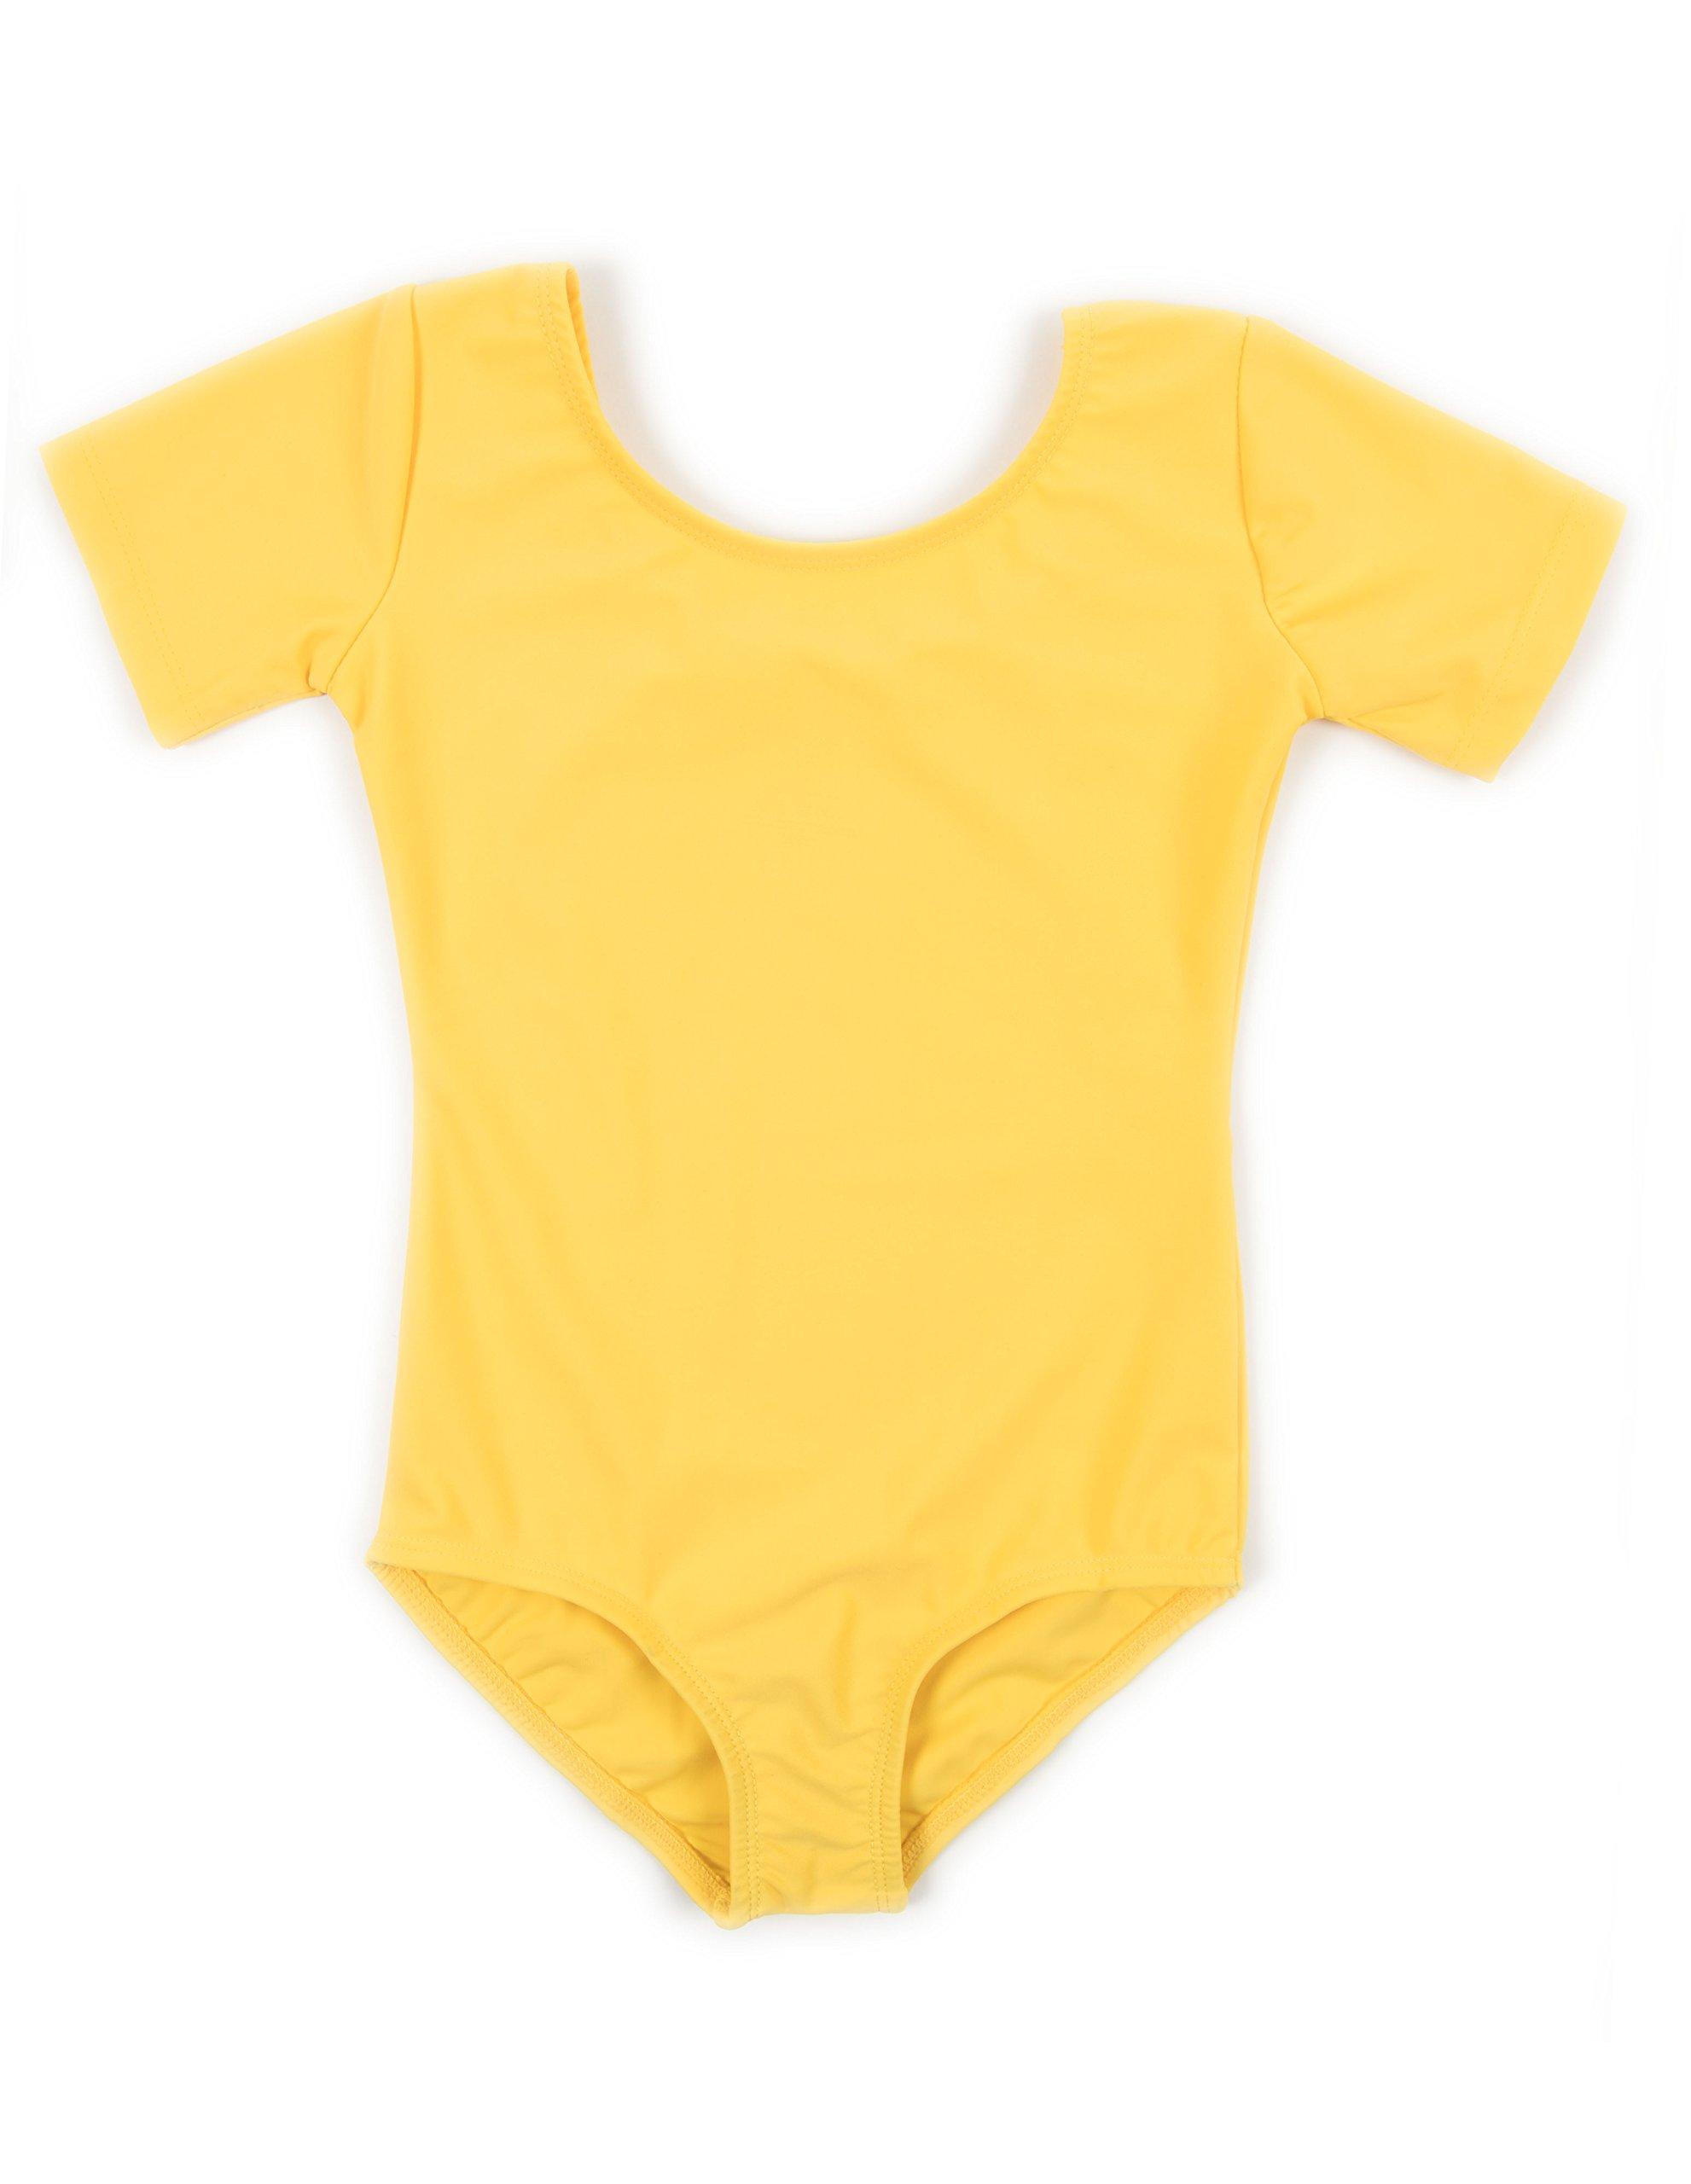 Leveret Girls Leotard Yellow Short Sleeve Small 6 8